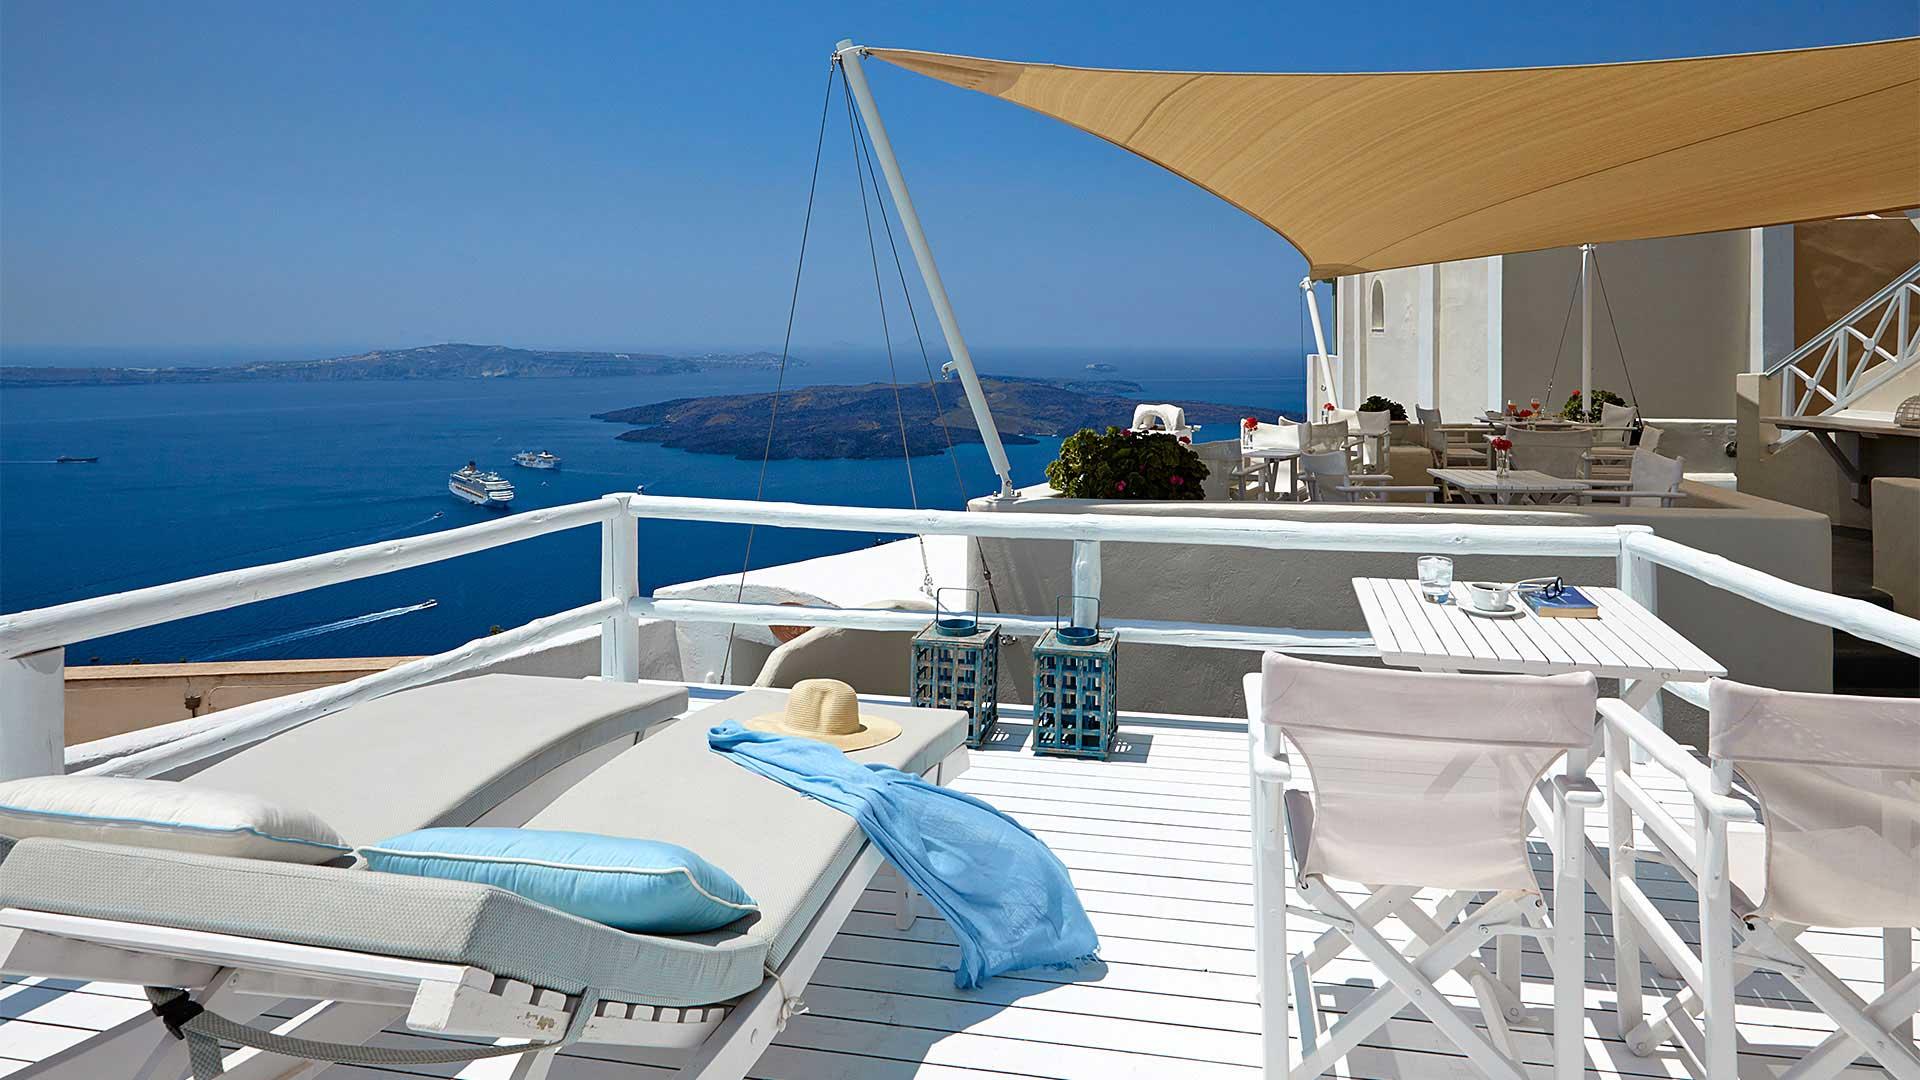 Santorini apartments with veranda and view to caldera